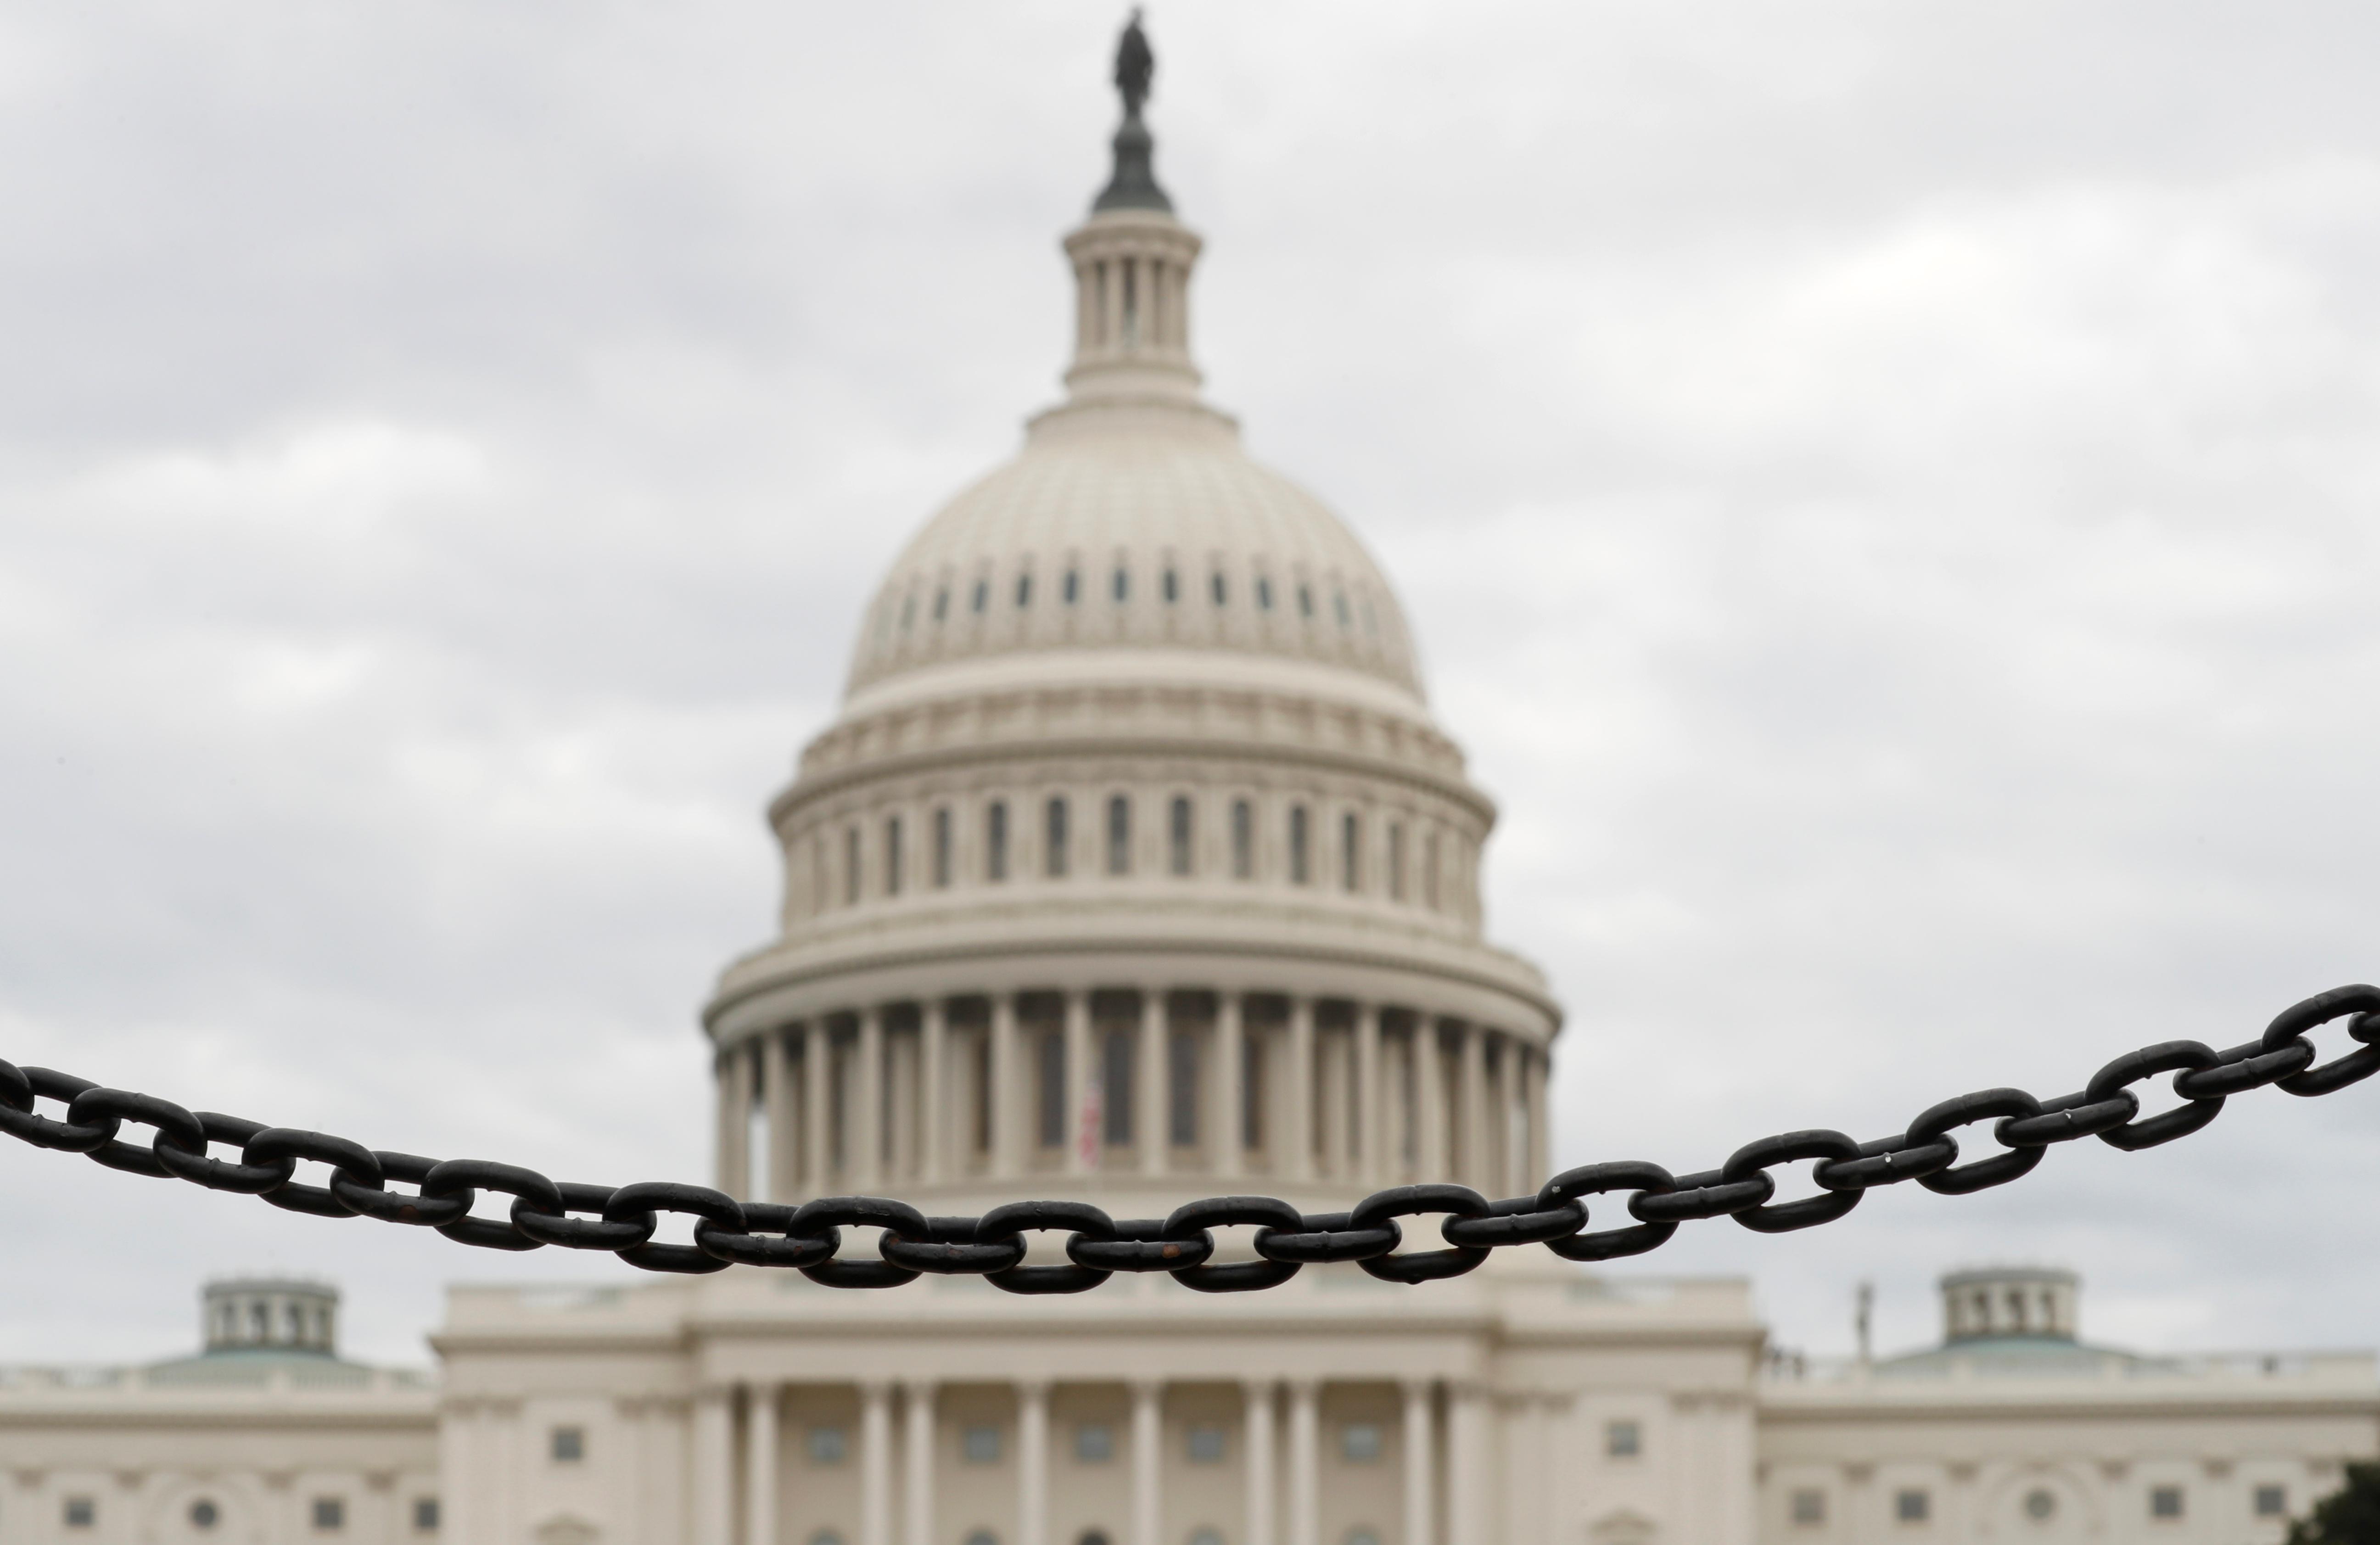 Blank-check company IPOs moving ahead despite U.S. government shutdown